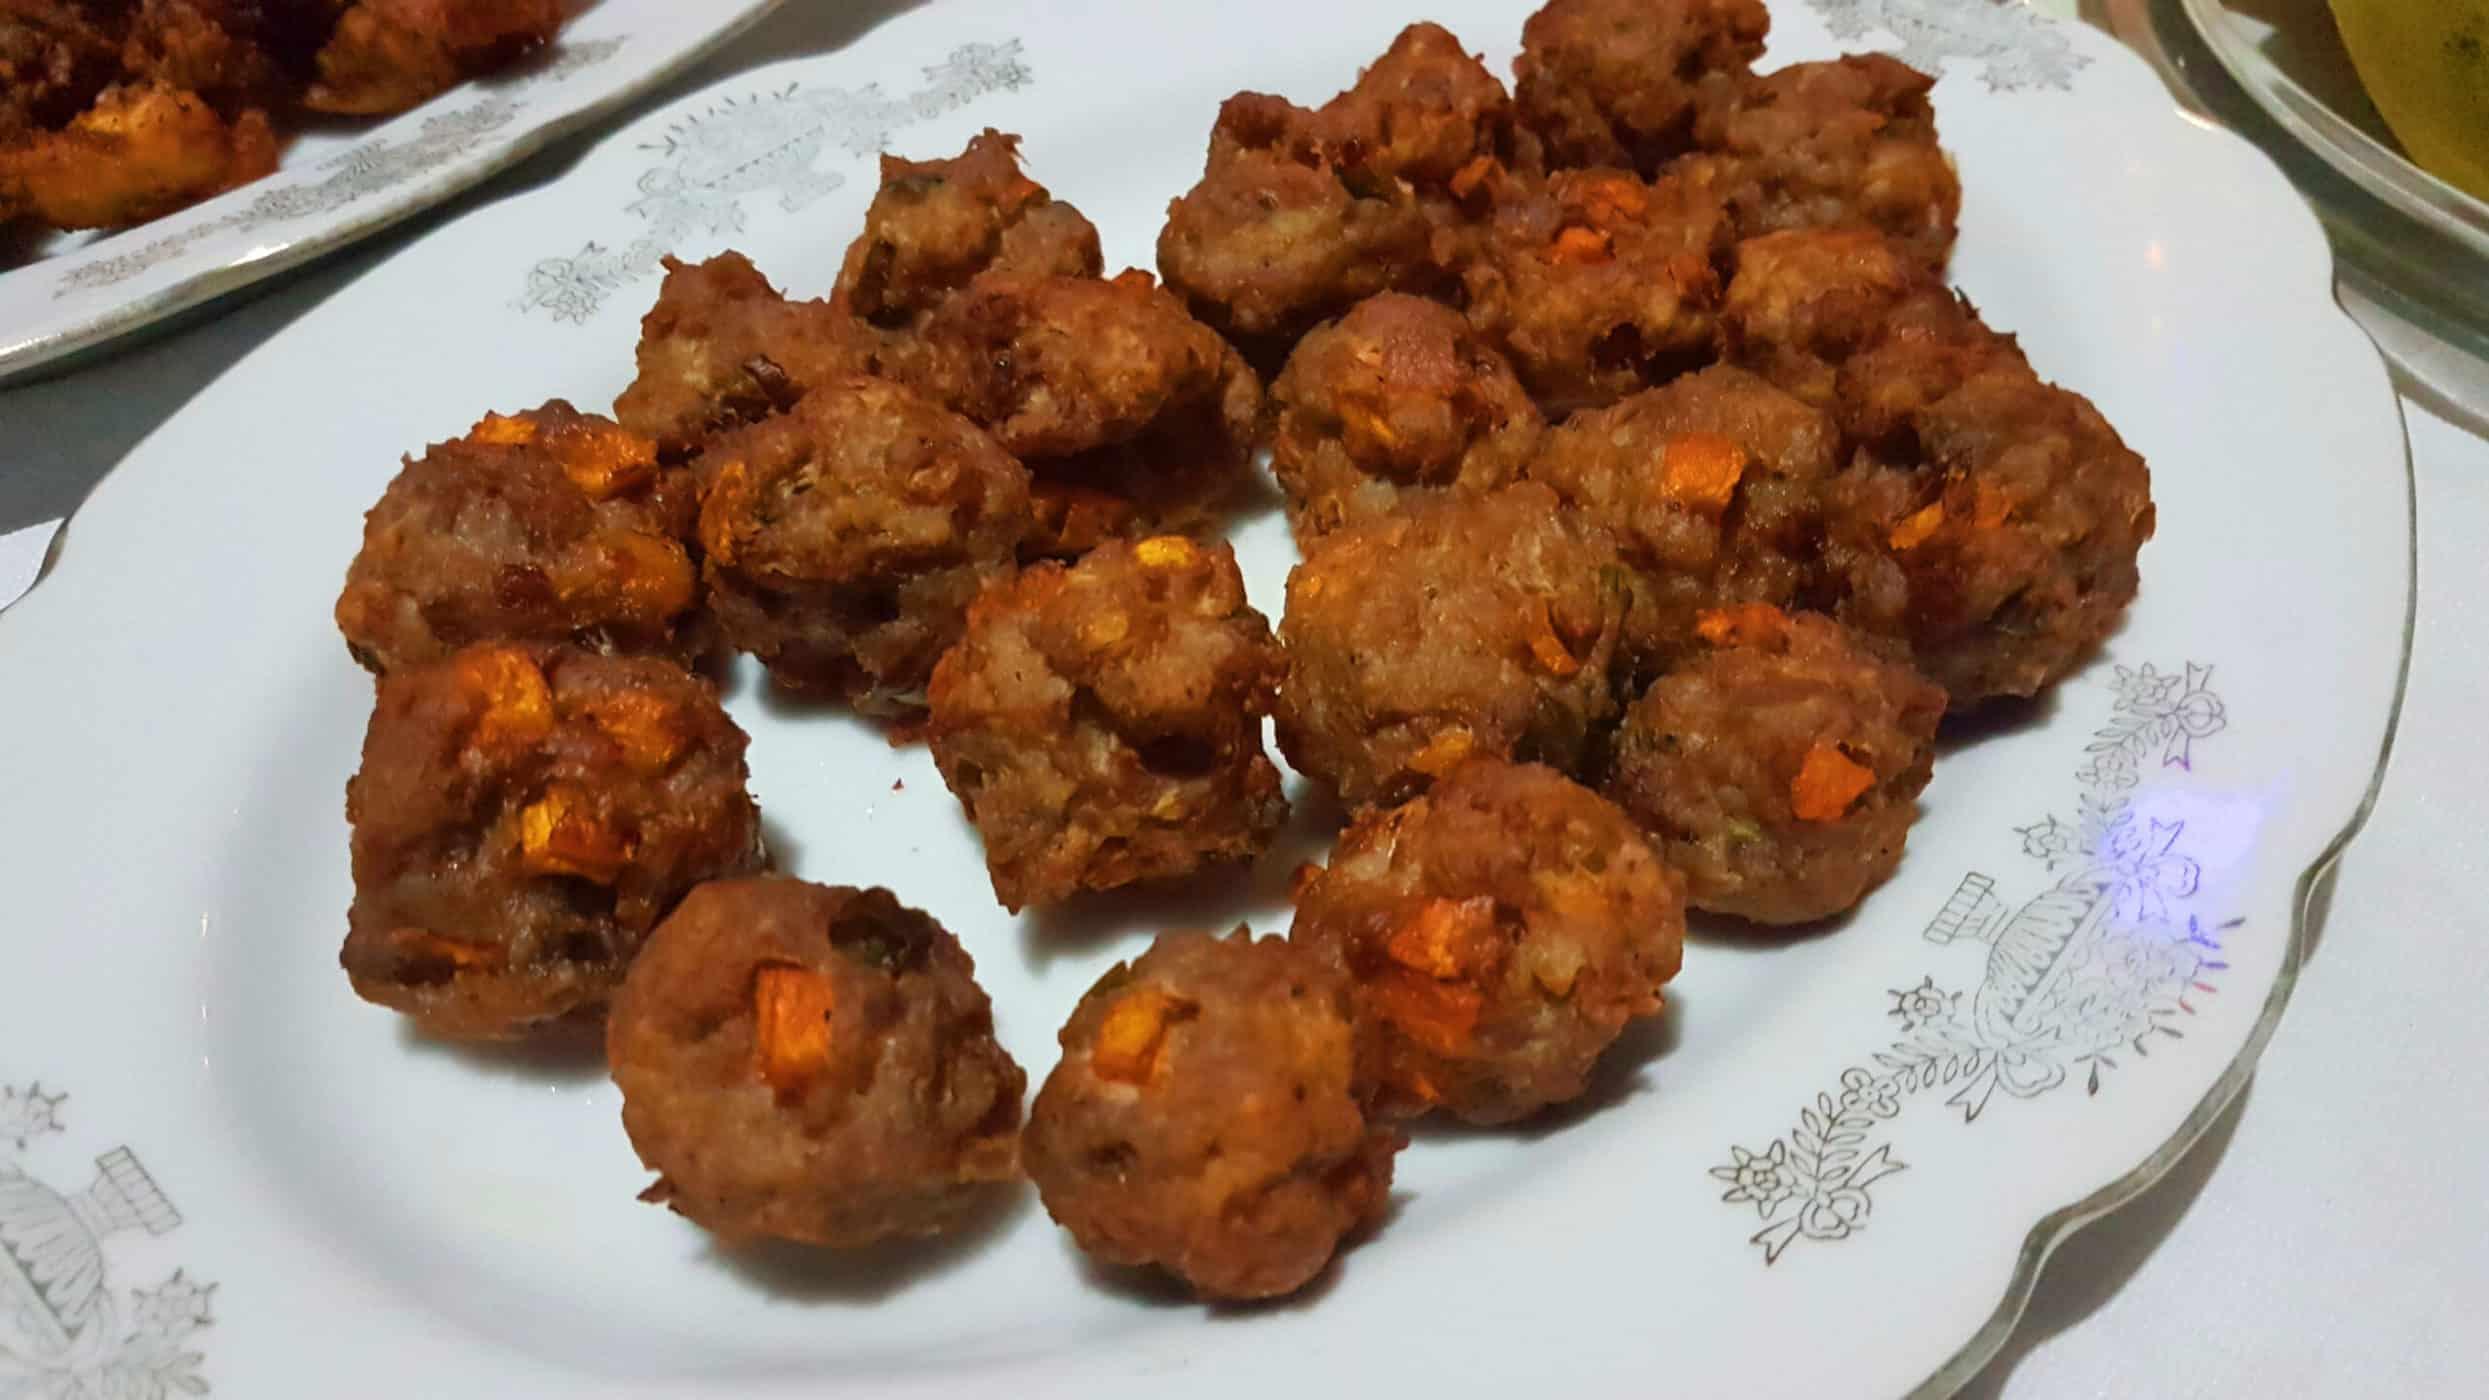 Bola-bola (Filipino Meatballs)